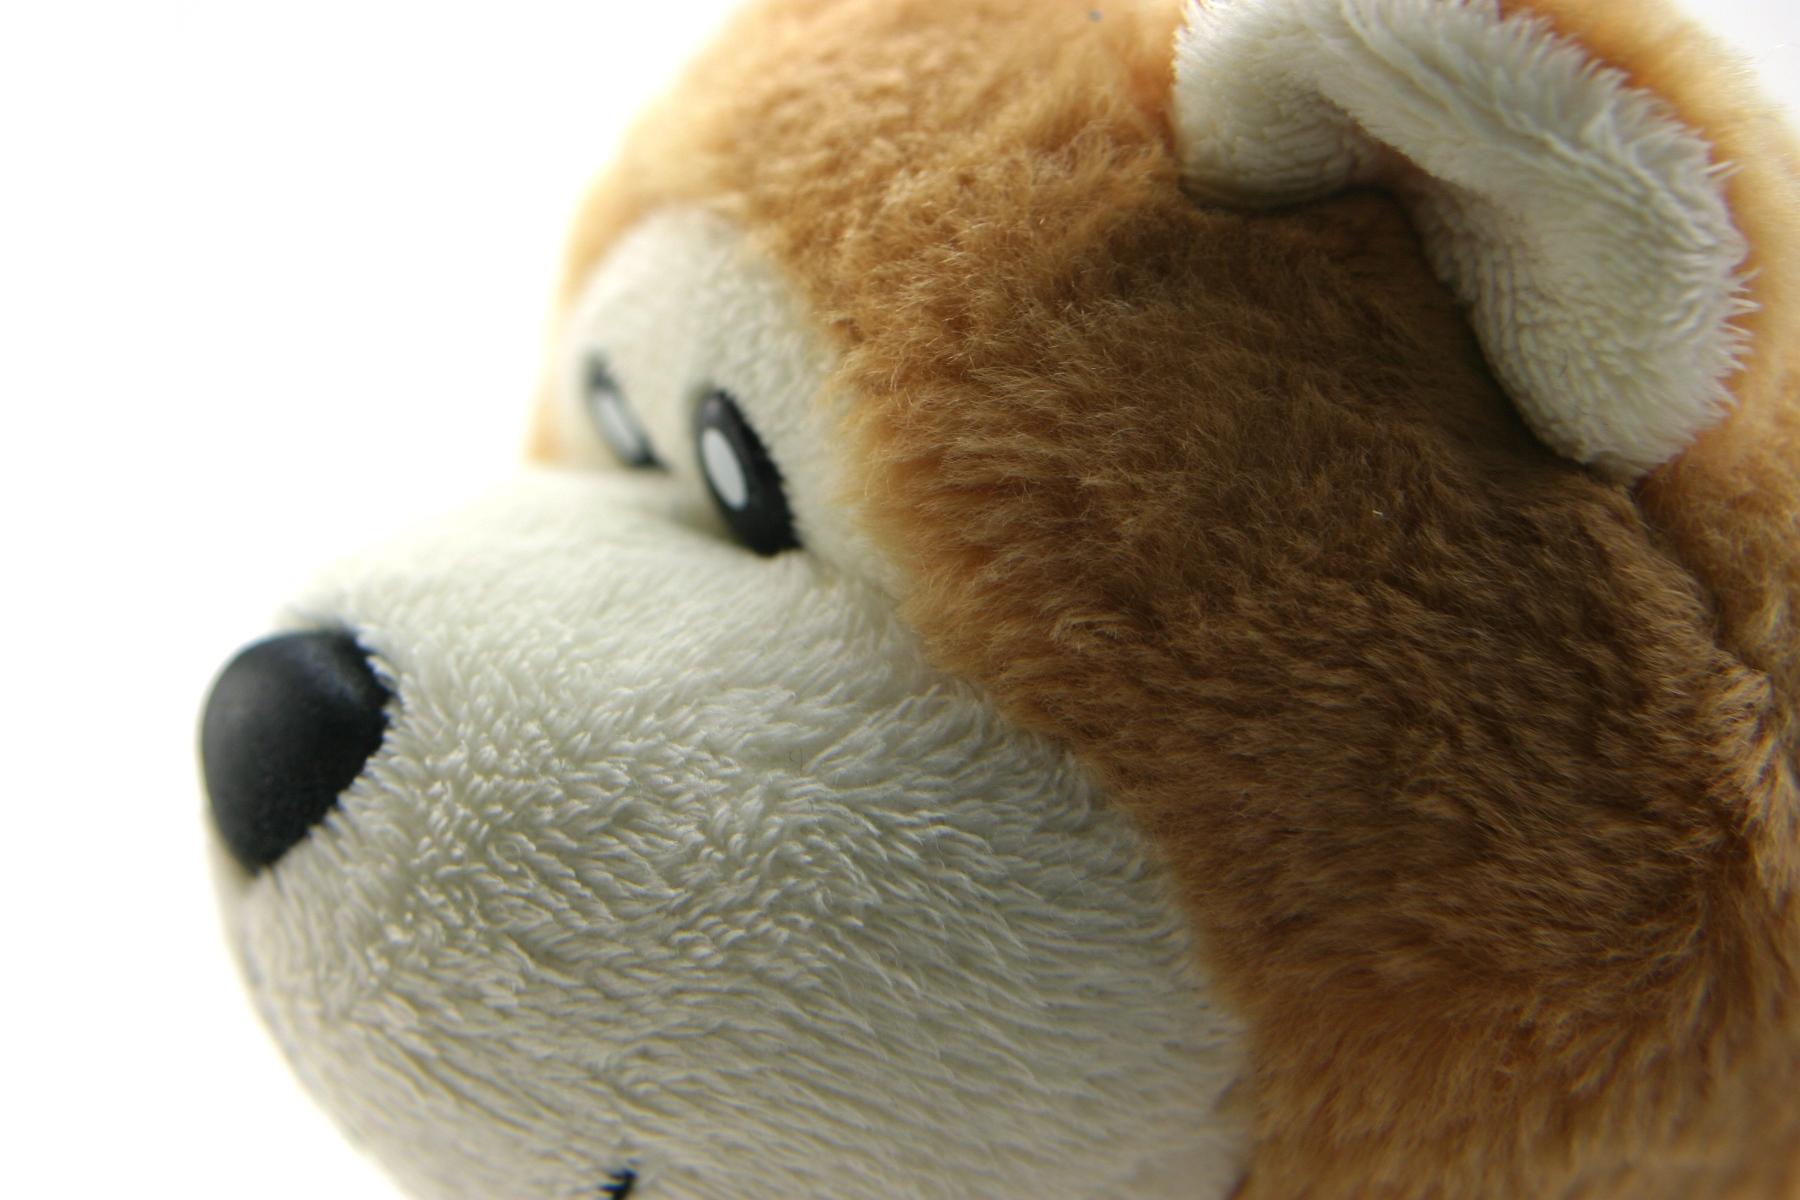 Classic teddy bear, Animal, Small, Old, Path, HQ Photo